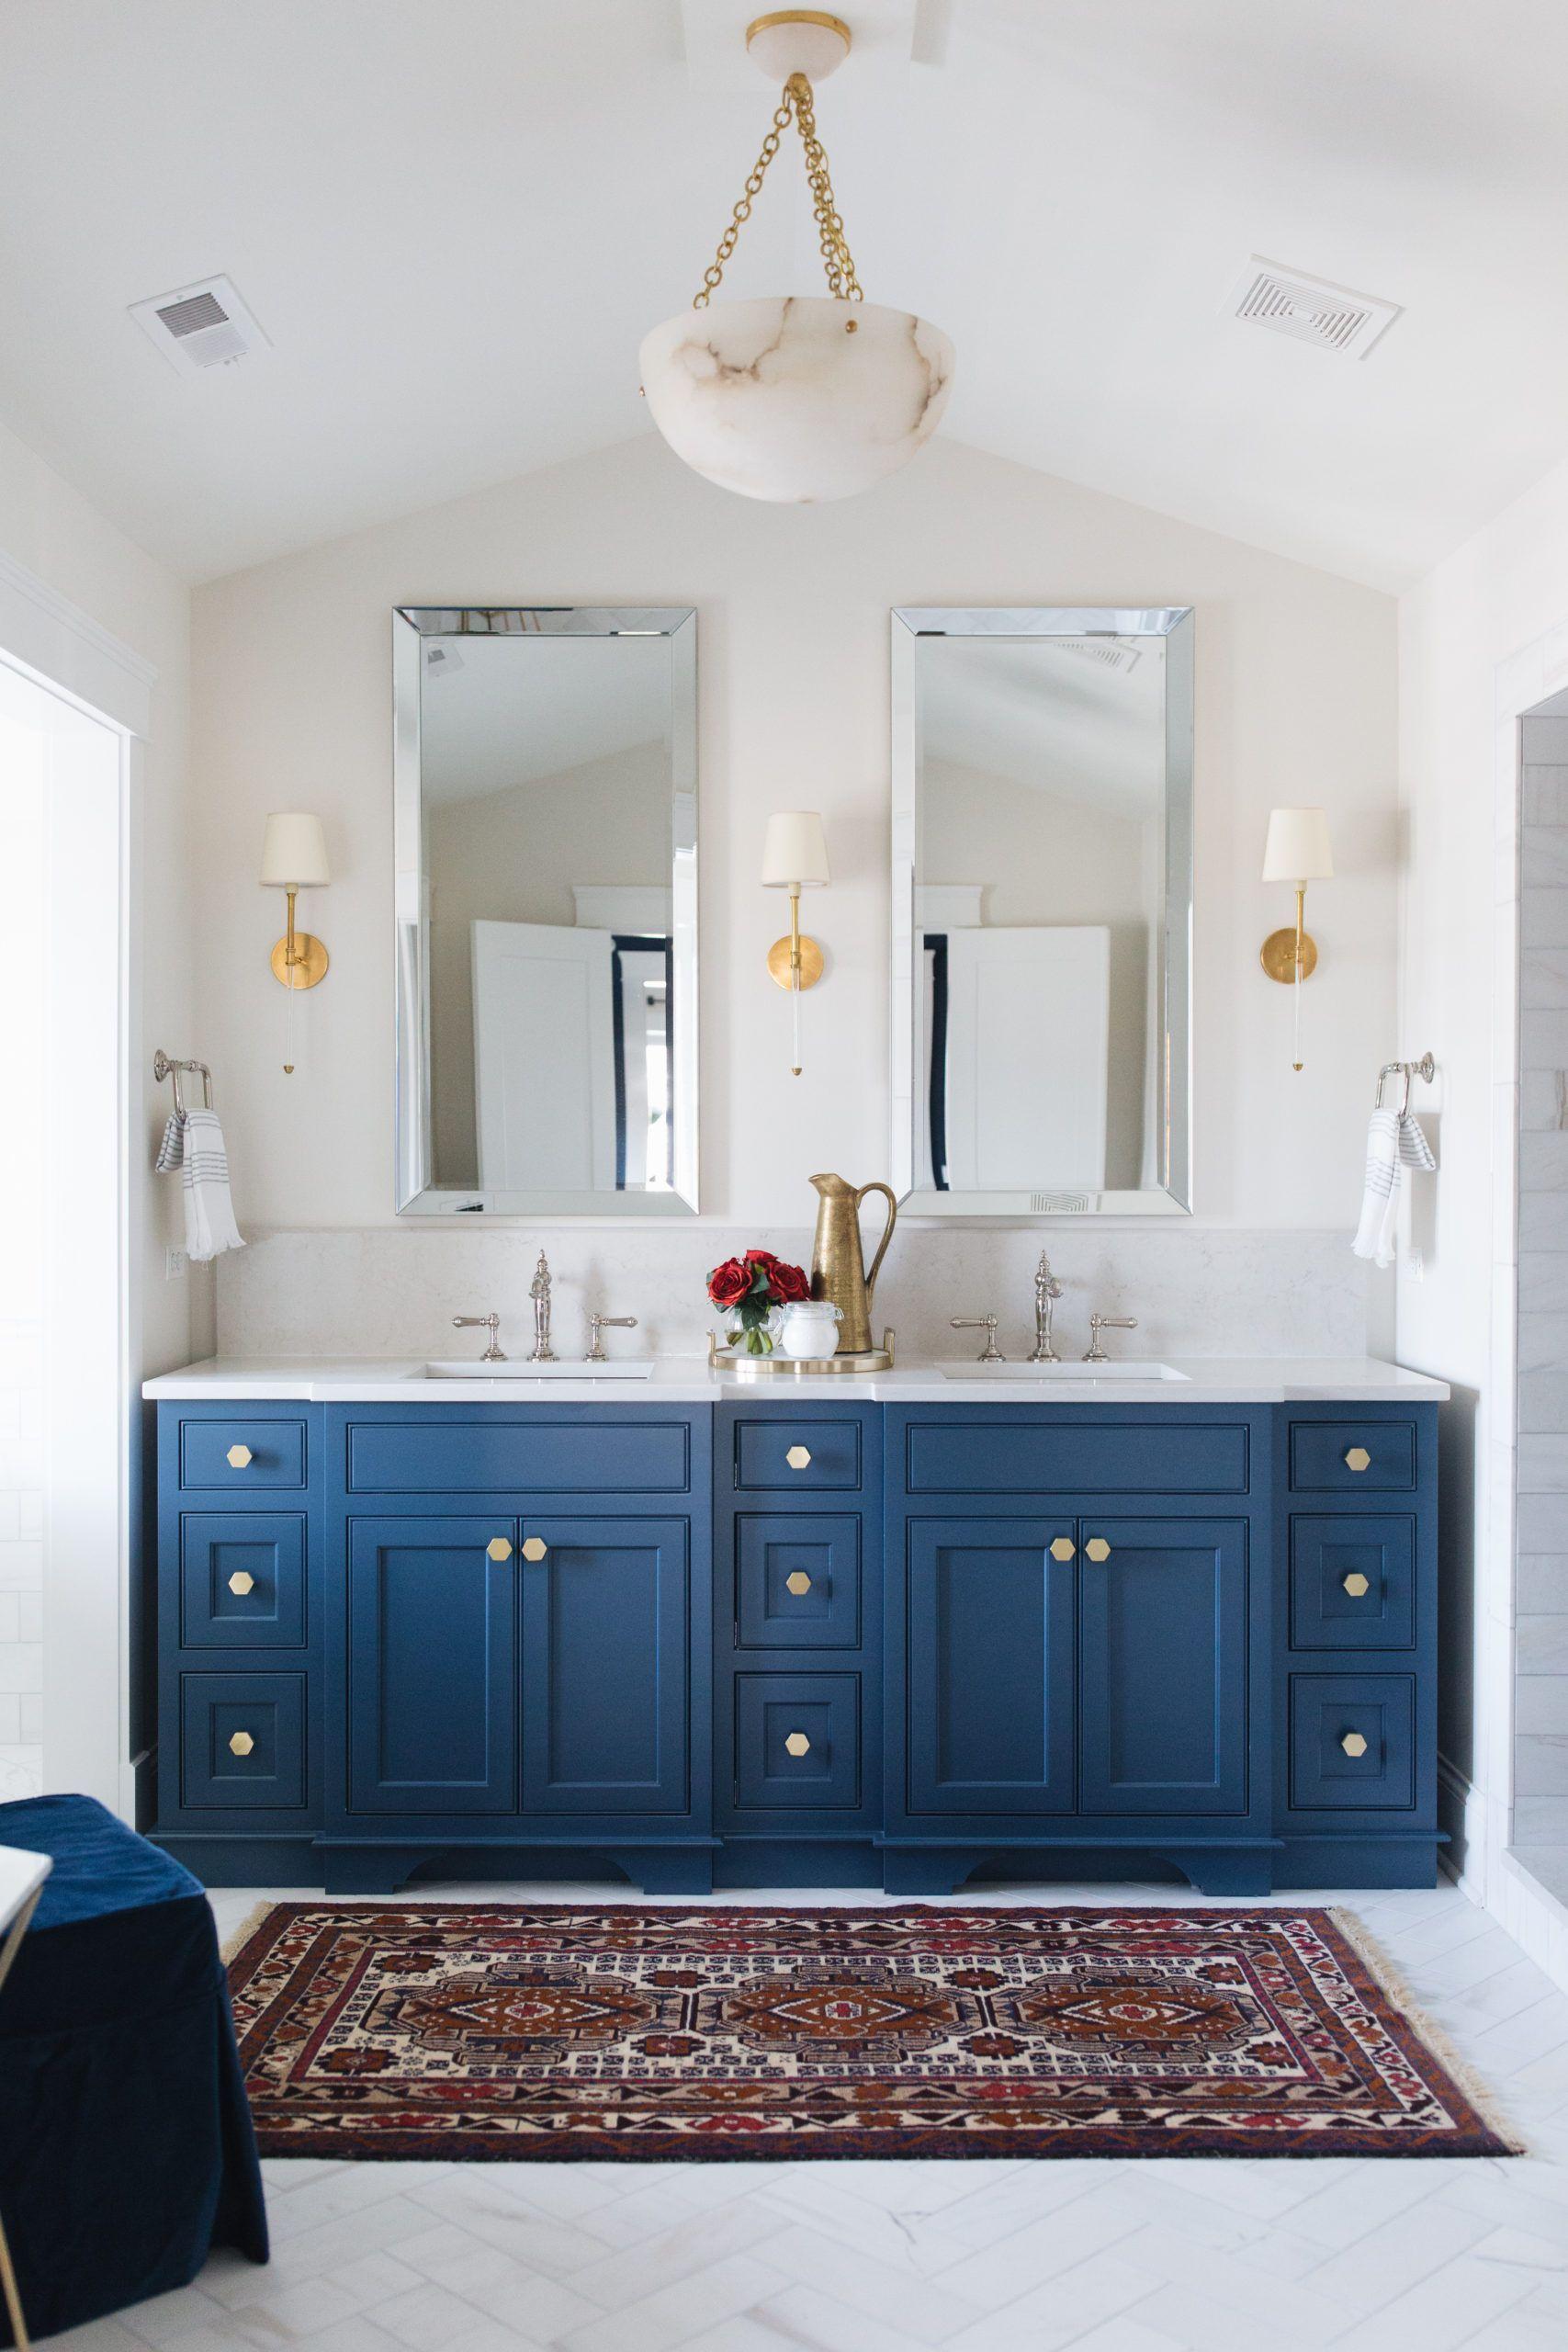 Beautiful Bathroom Decor And Design Ideas In 2021 Beautiful Bathroom Decor Double Sink Bathroom Vanity Blue Bathroom